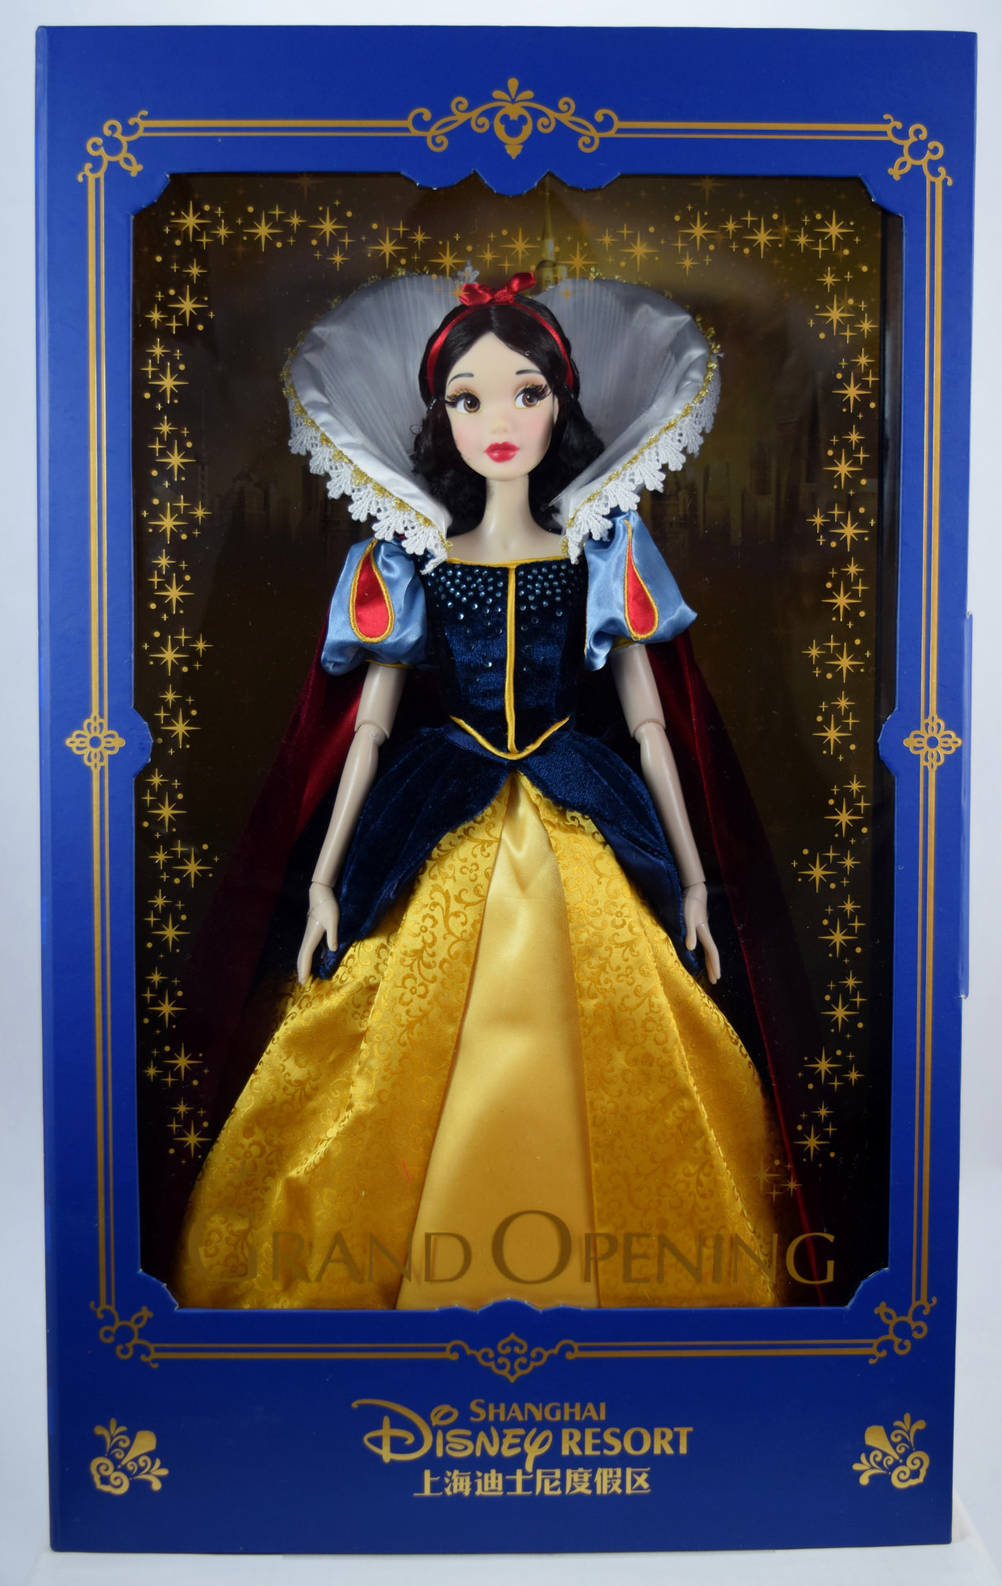 Filmic Light Snow White Archive 2016 Shanghai Disney